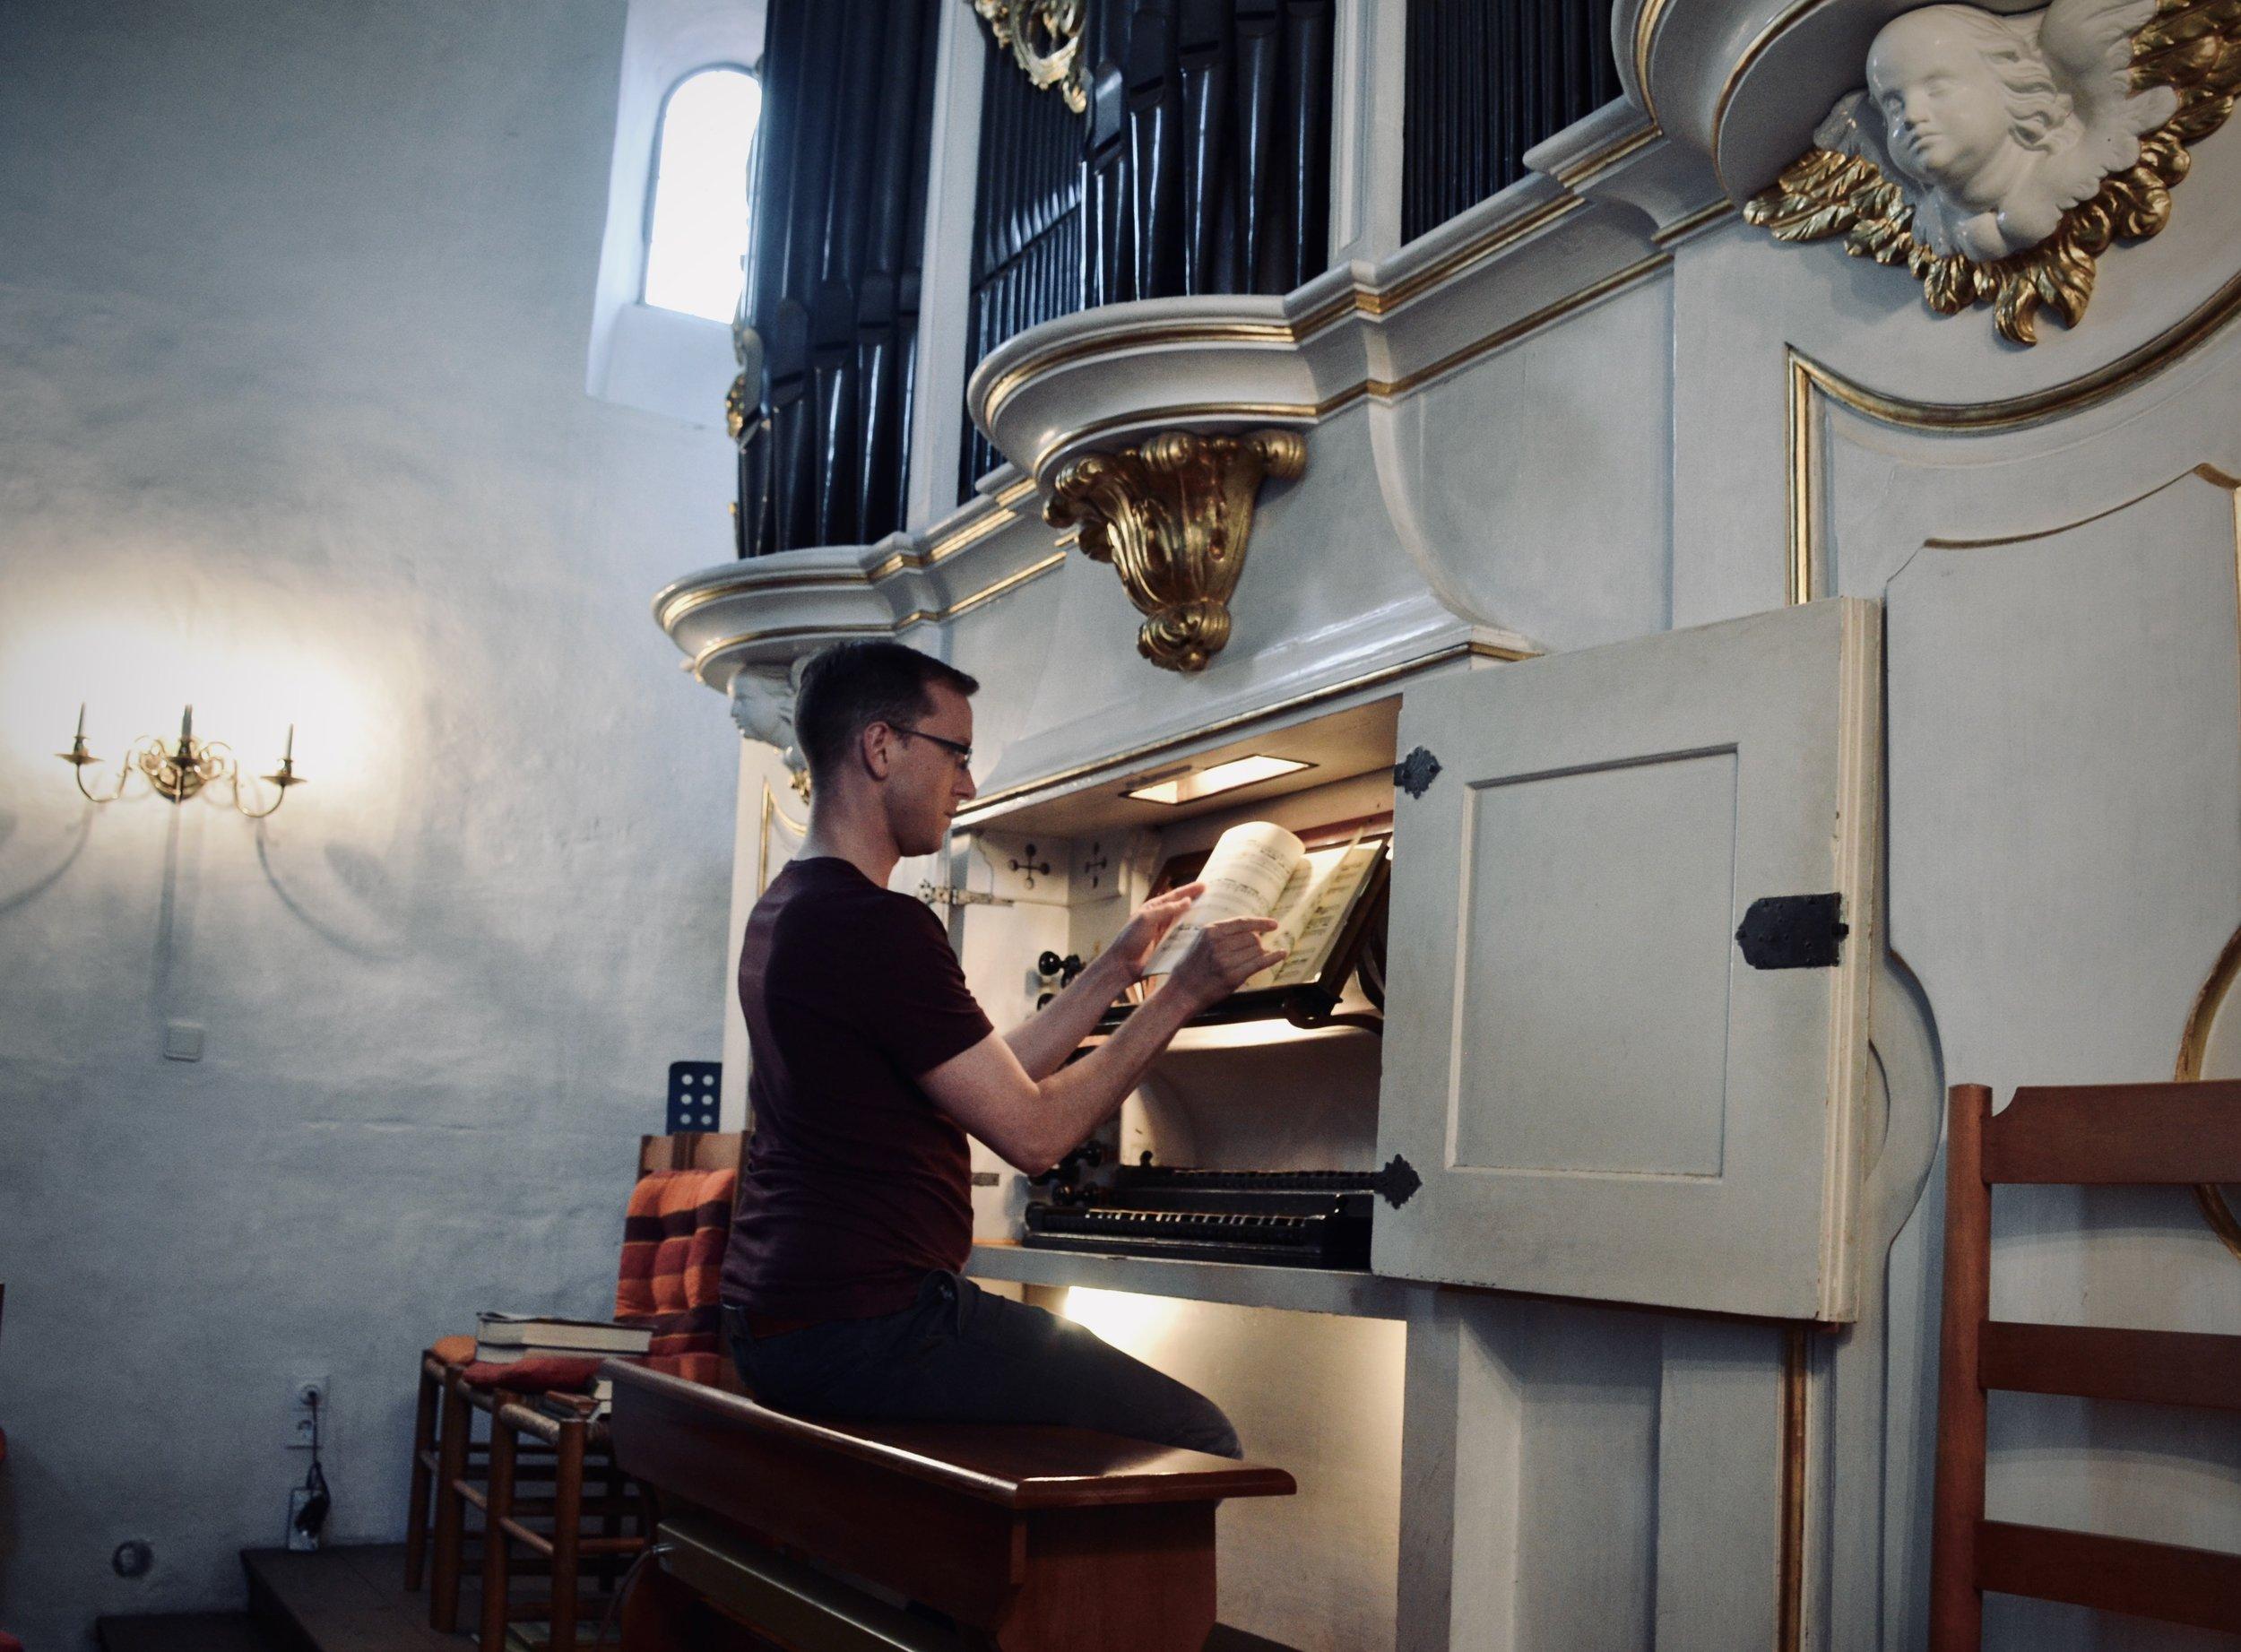 Christian Lane plays the 1722 Gottfried Silbermann Organ, Killianskirche, Bad Lausick